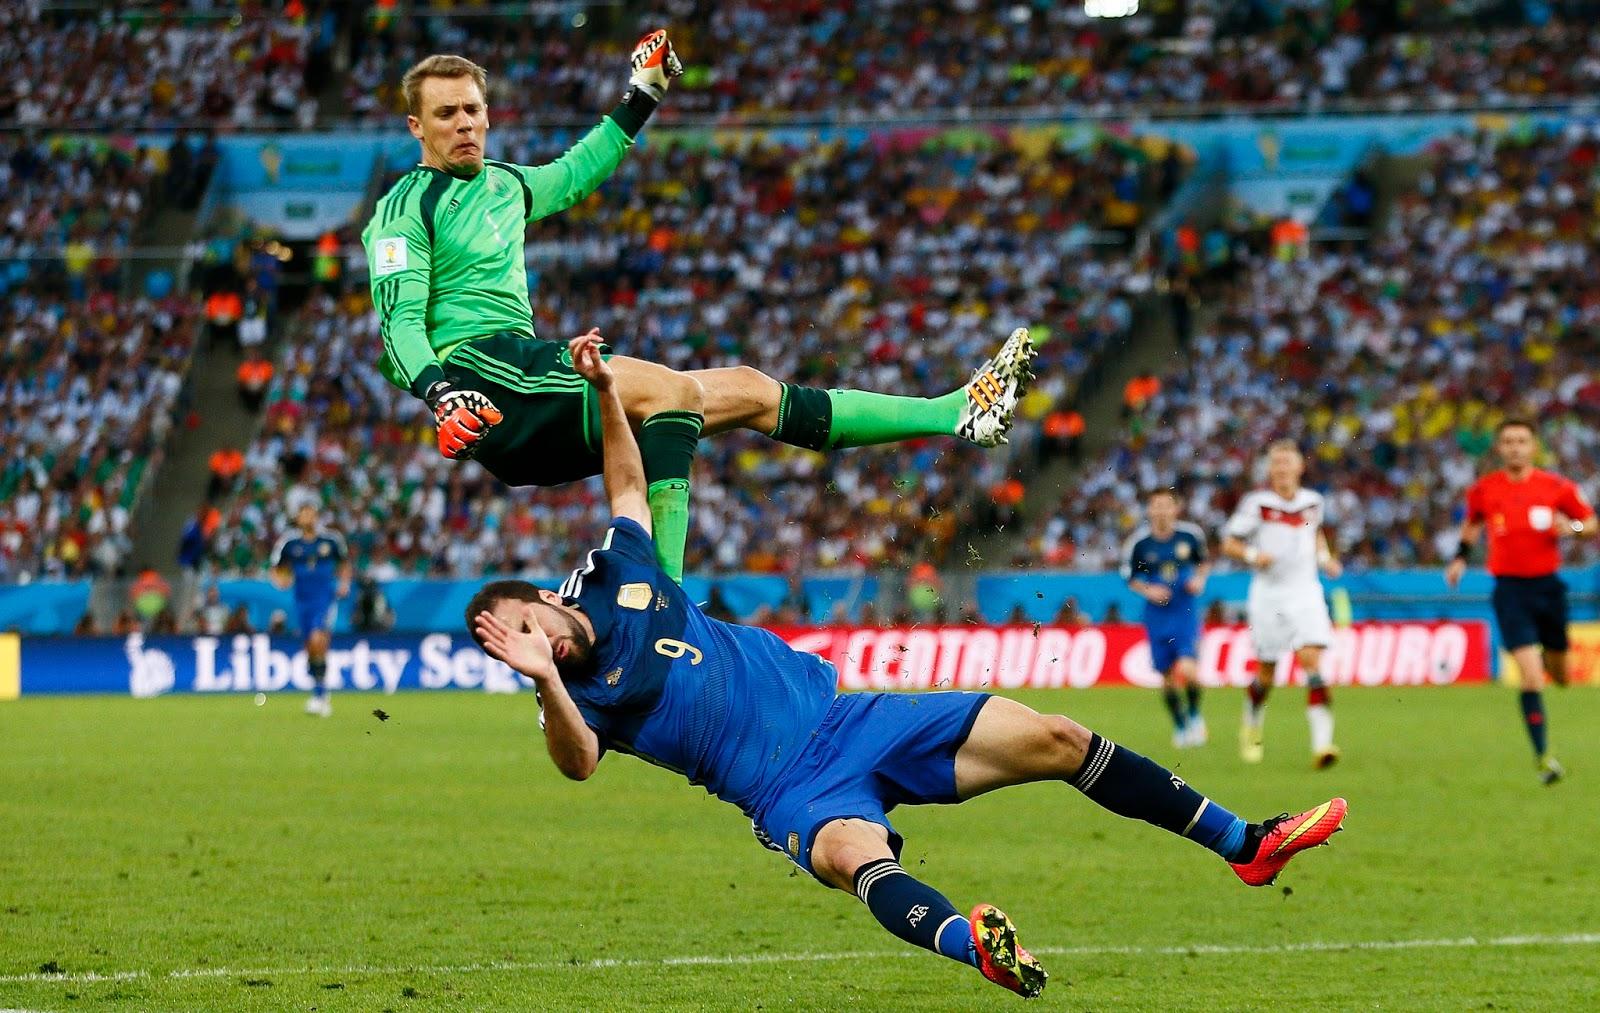 Manuel Neuer, le gardien libéro